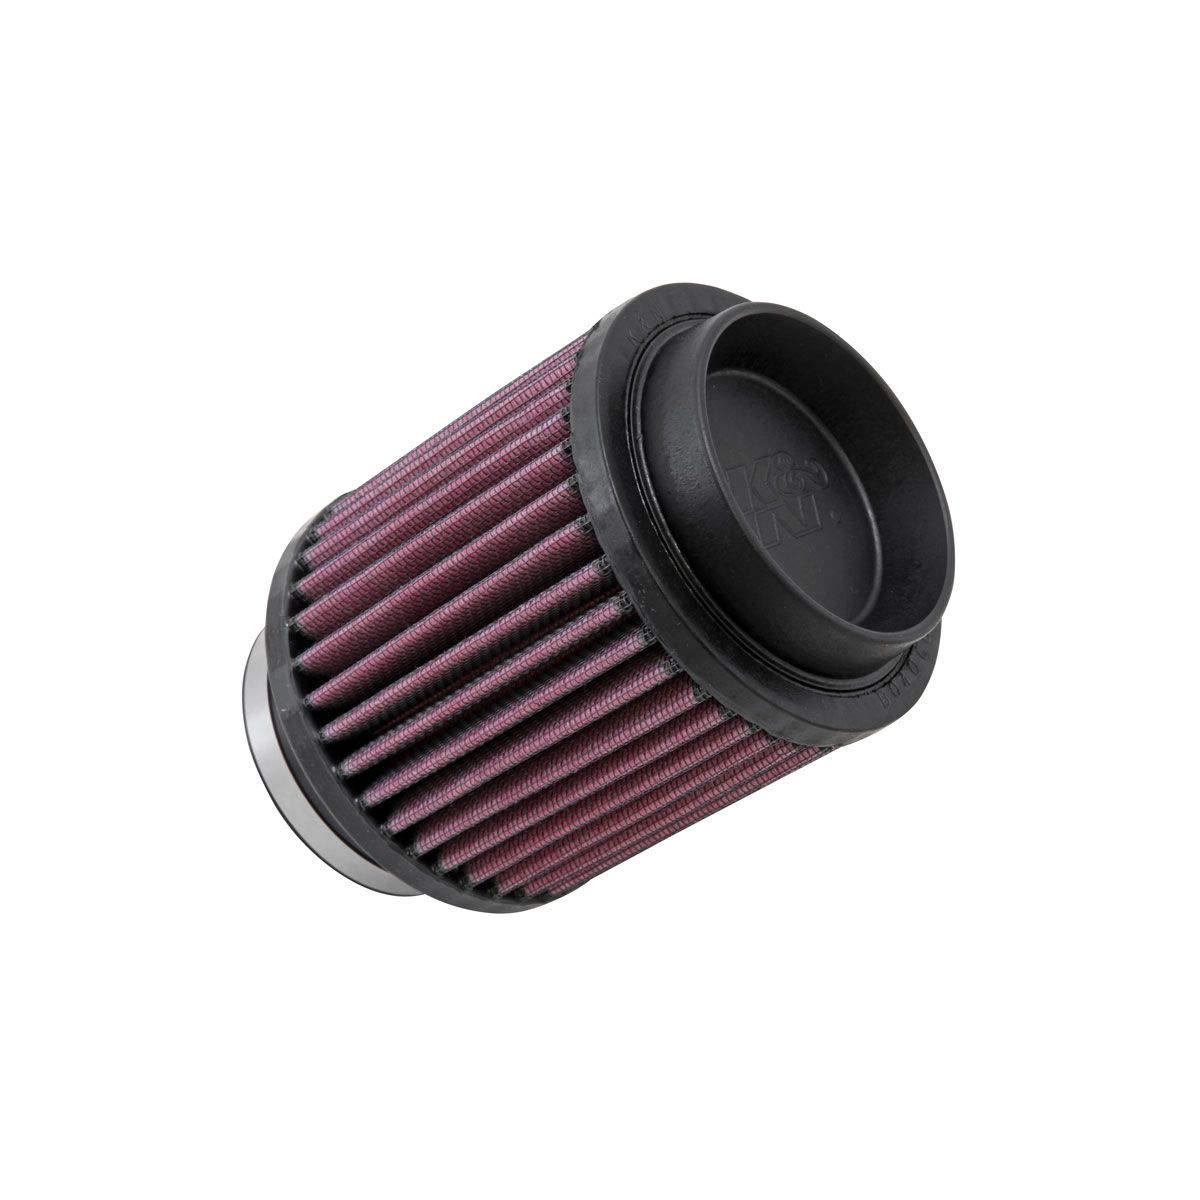 09-19 POLARIS RANRZR170: K&N Air Filter (Standard)